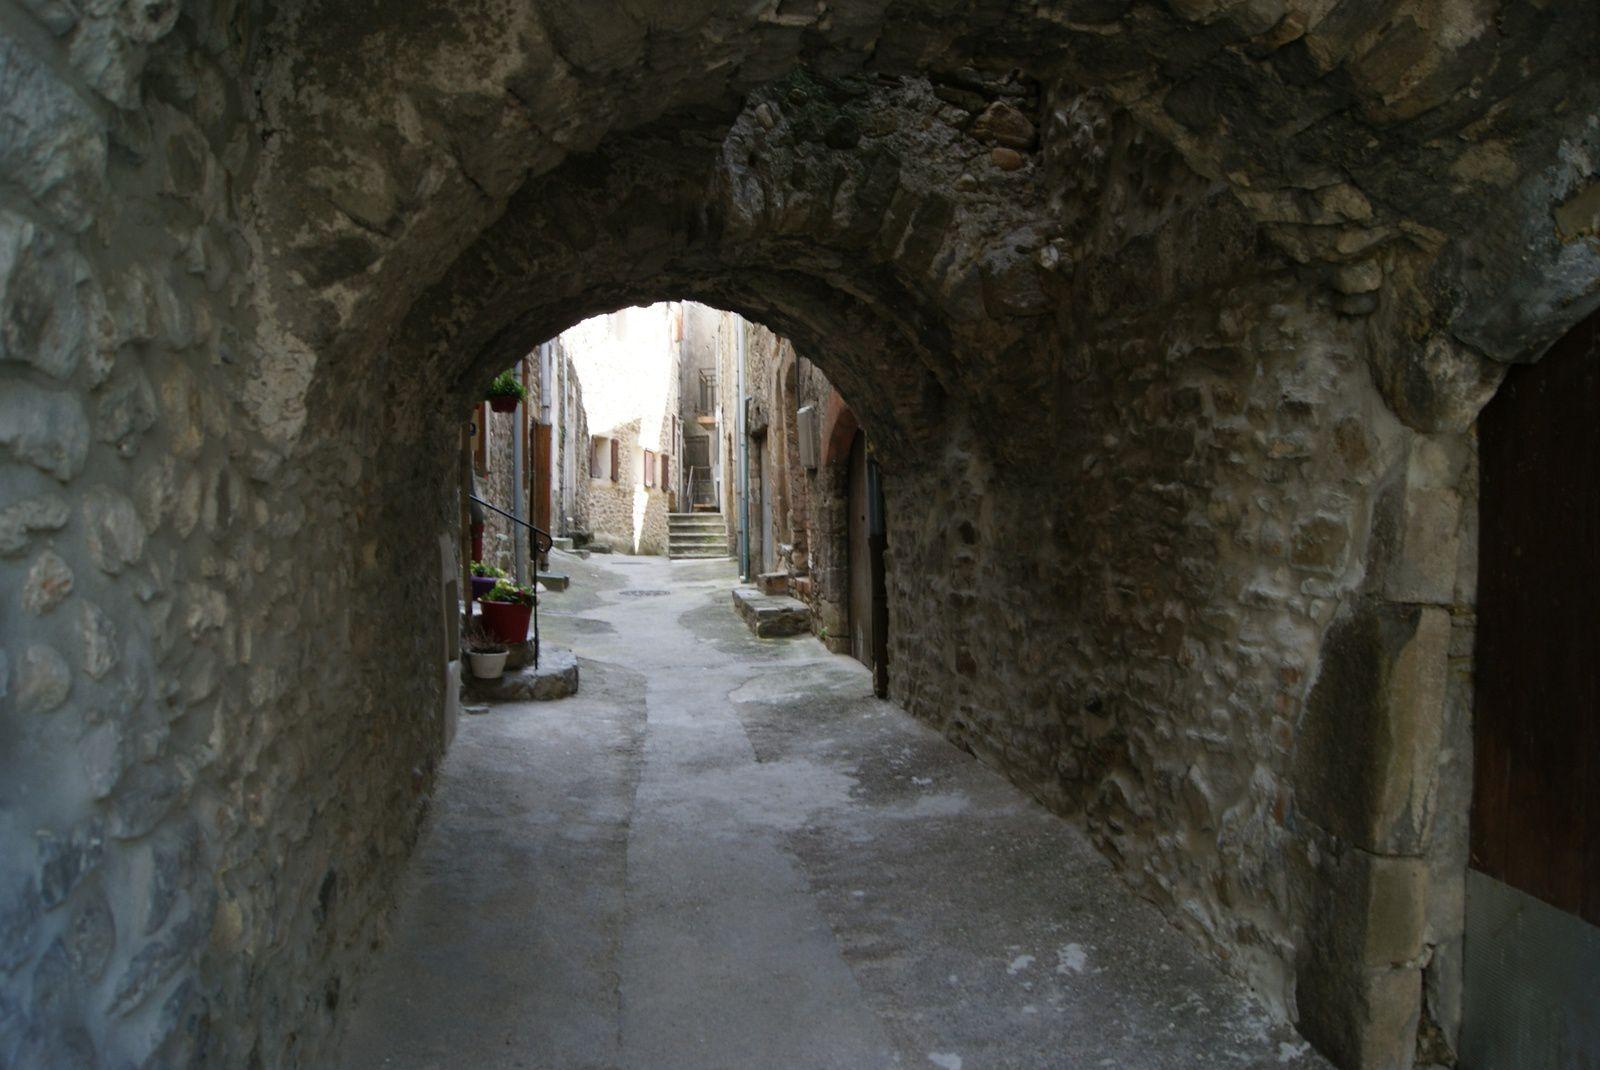 Saint Ambroix